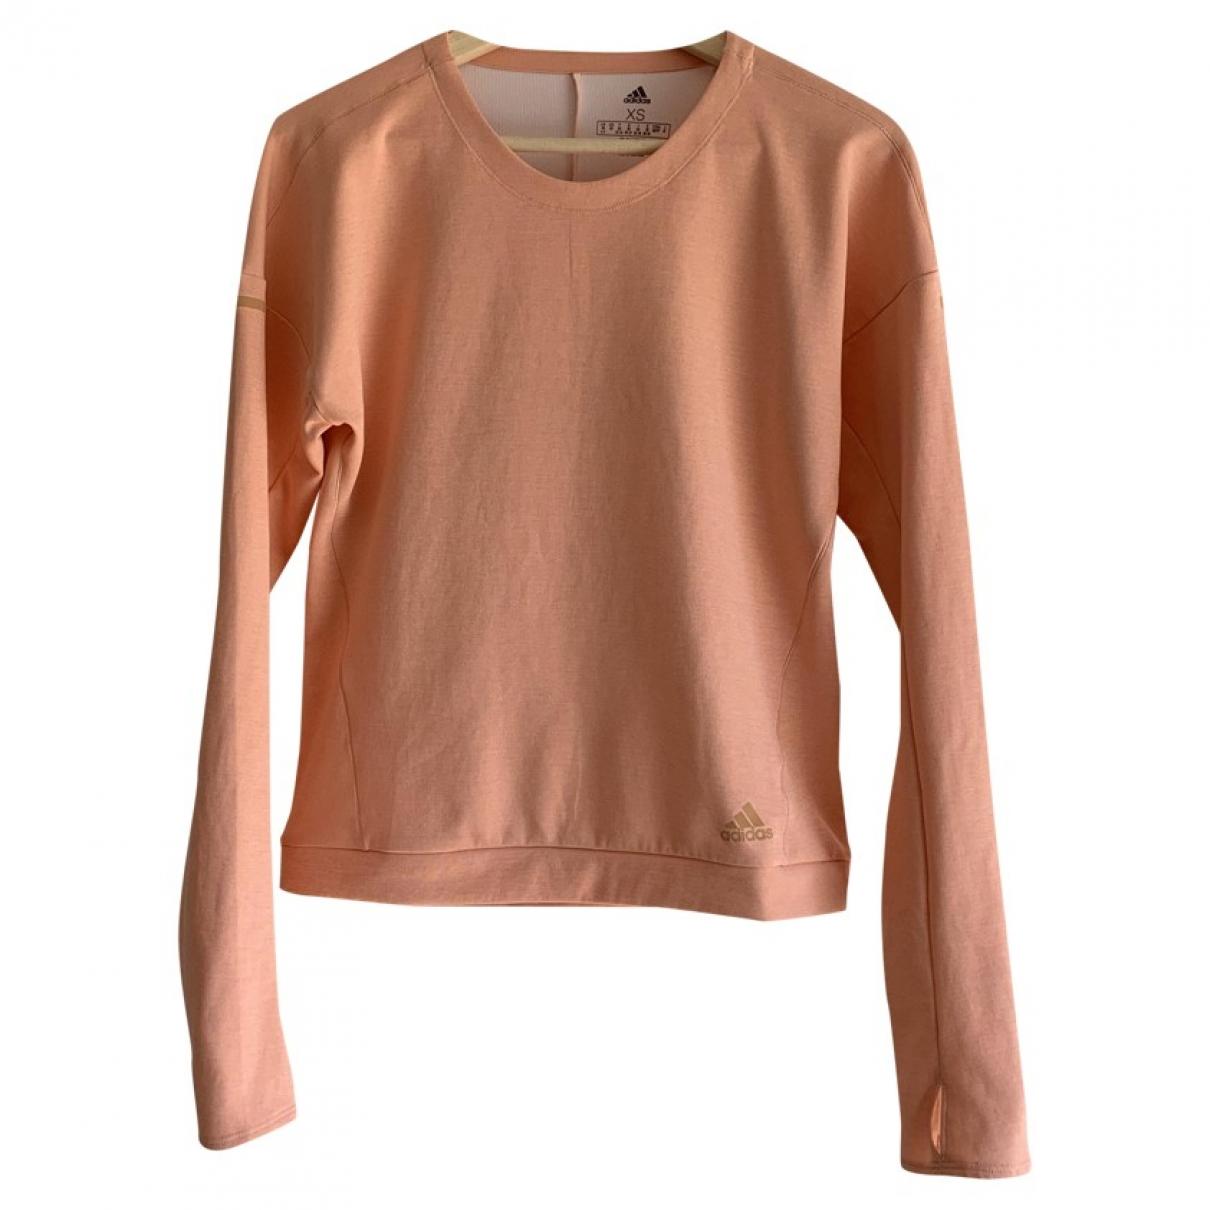 Adidas \N Pink  top for Women XS International